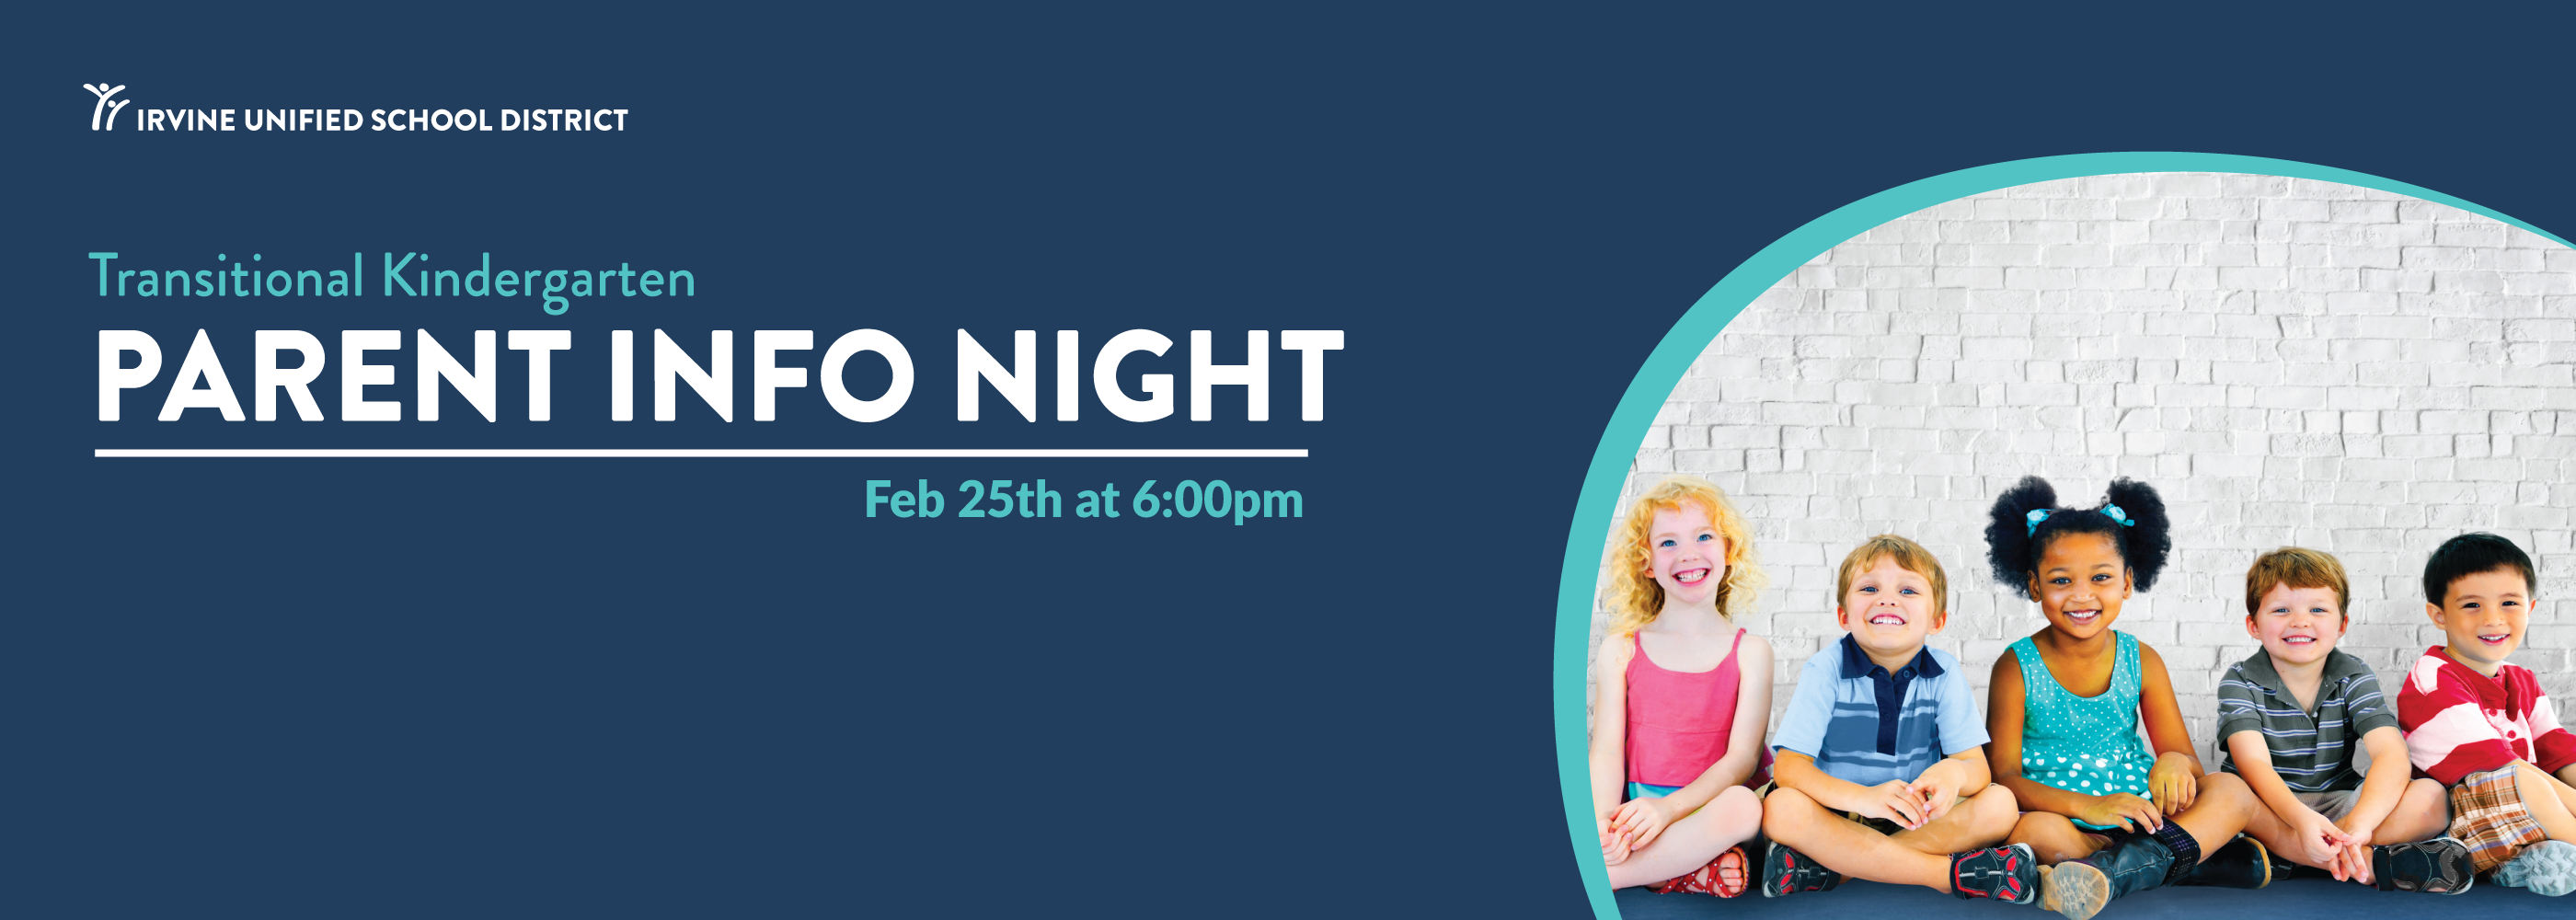 TK Parent Information Night